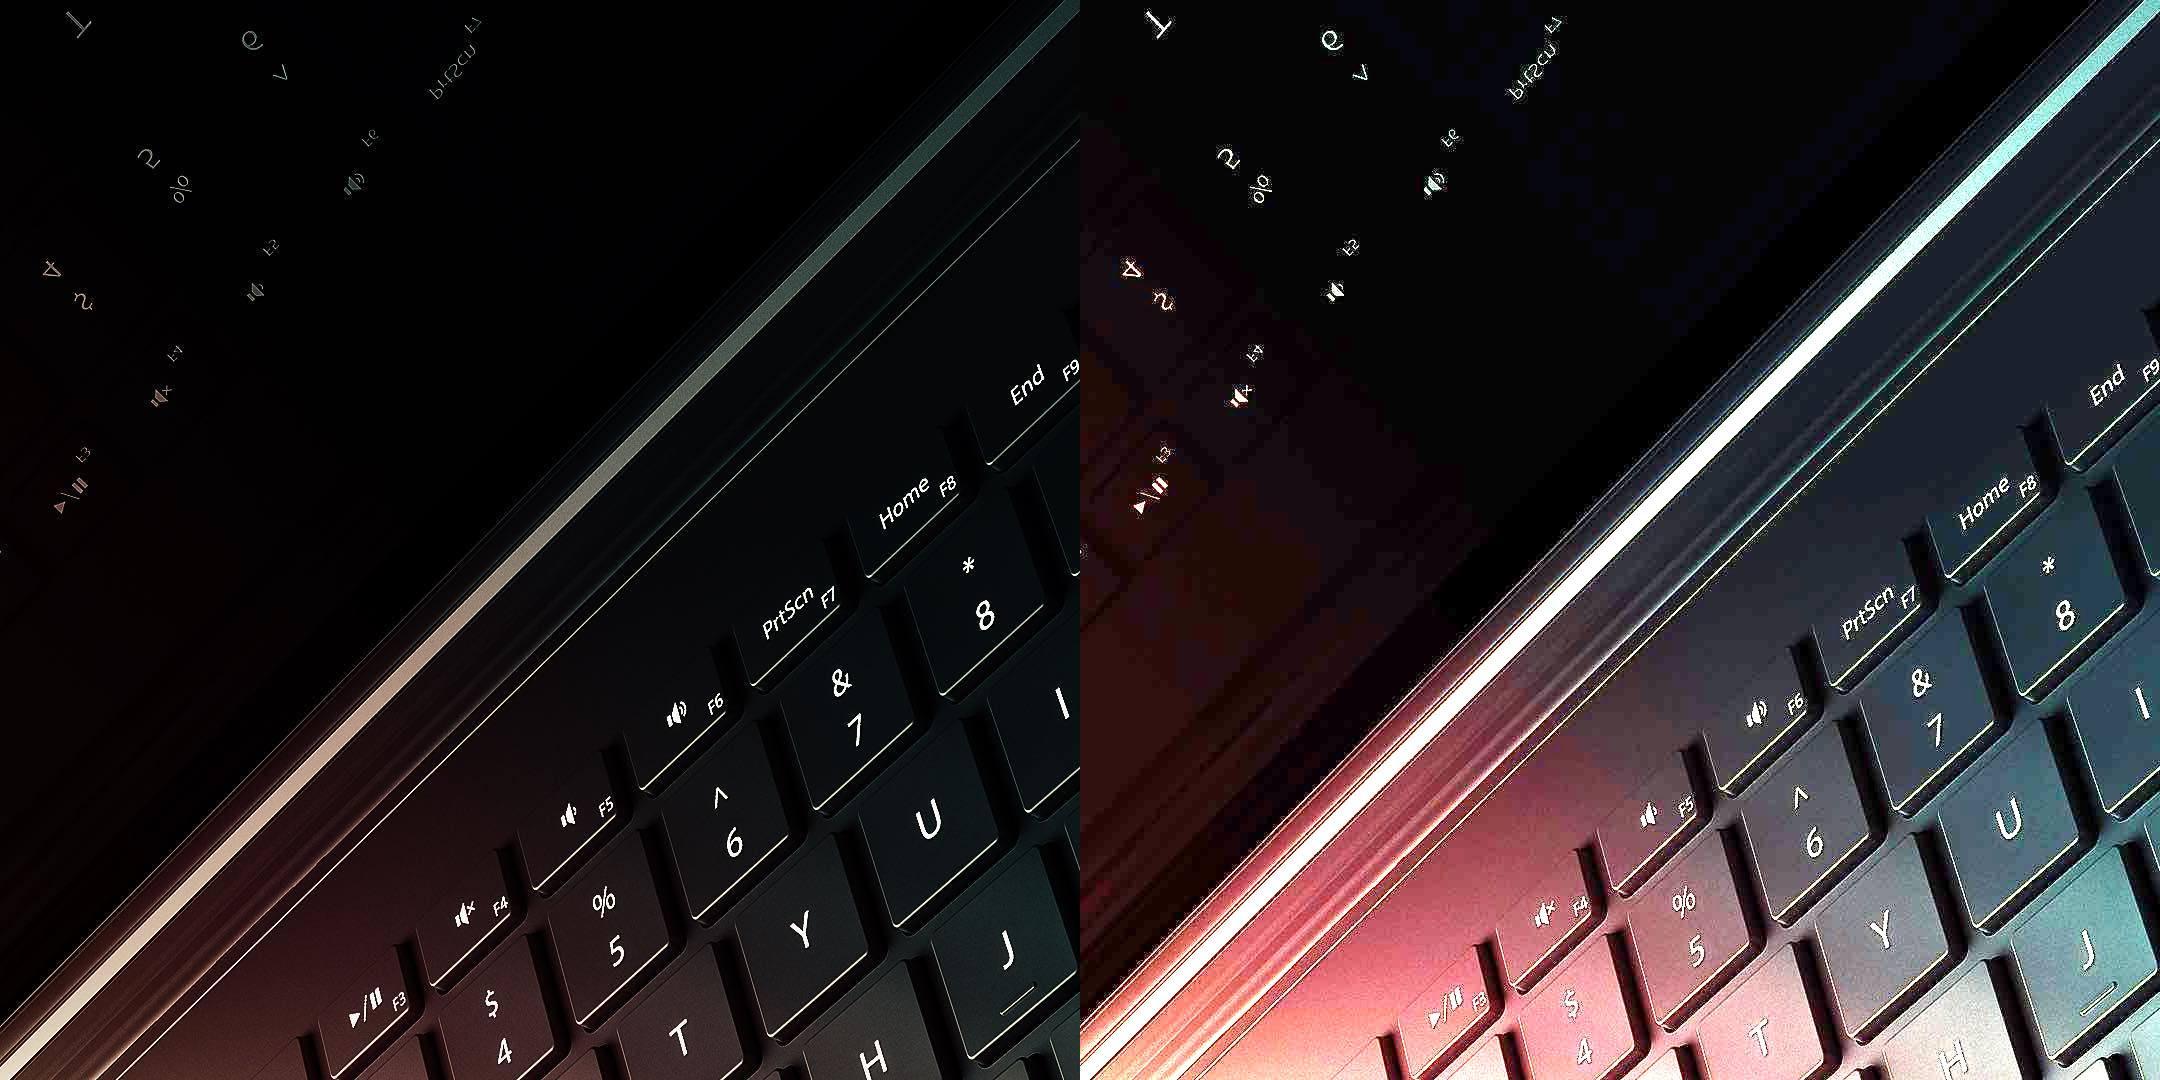 Microsoft Surface Book 2 Scharnier Leak